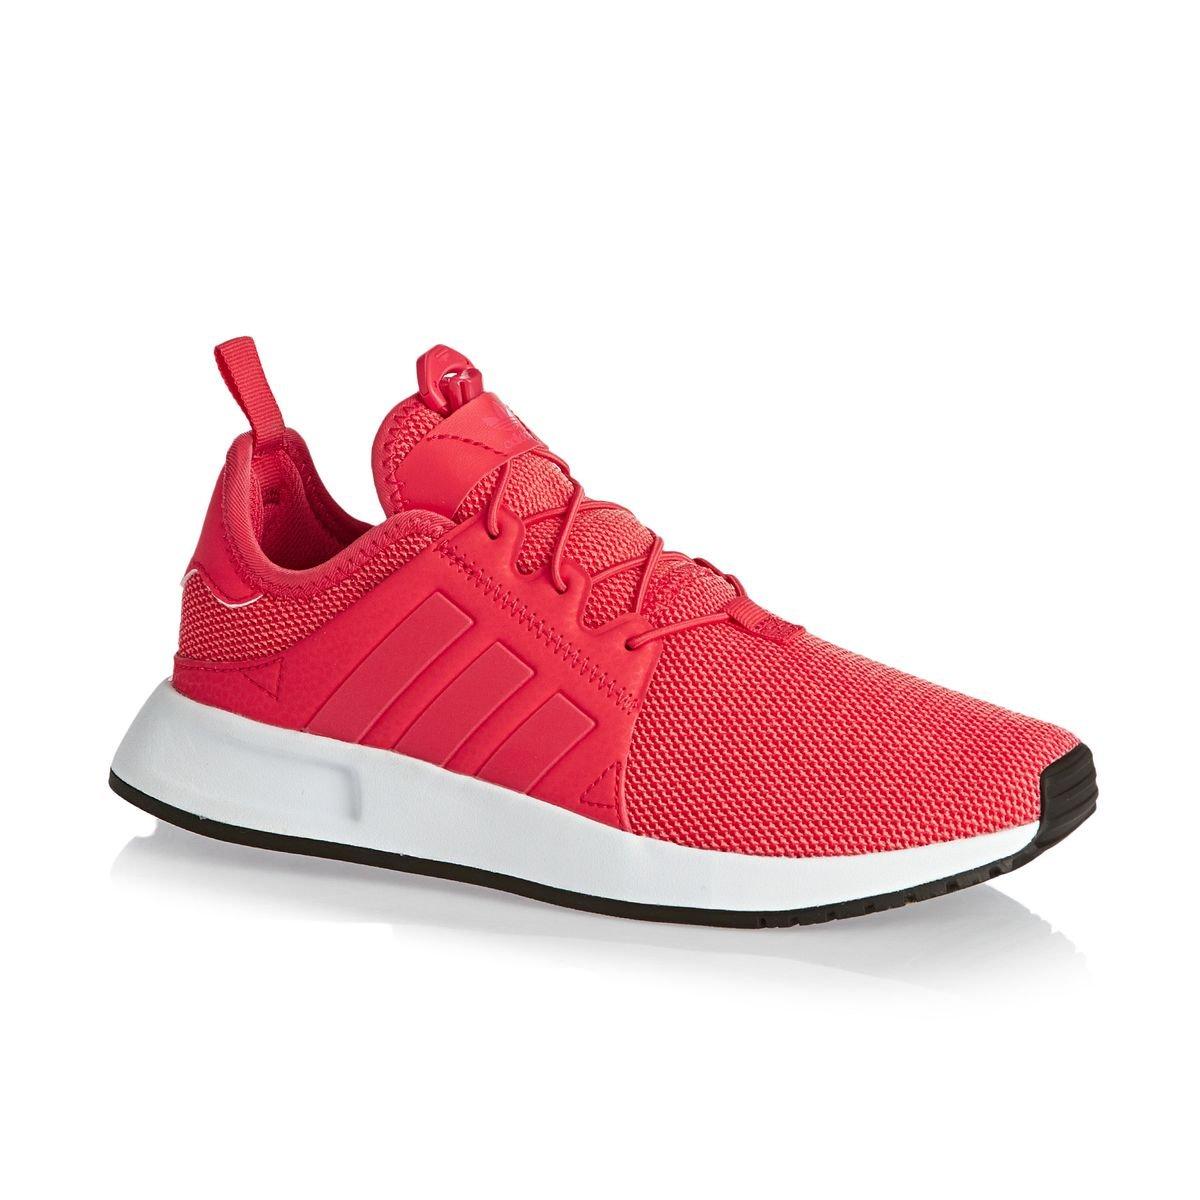 adidas Unisex Adults  X PLR J 579 Trainers  Amazon.co.uk  Shoes   Bags 49985019a